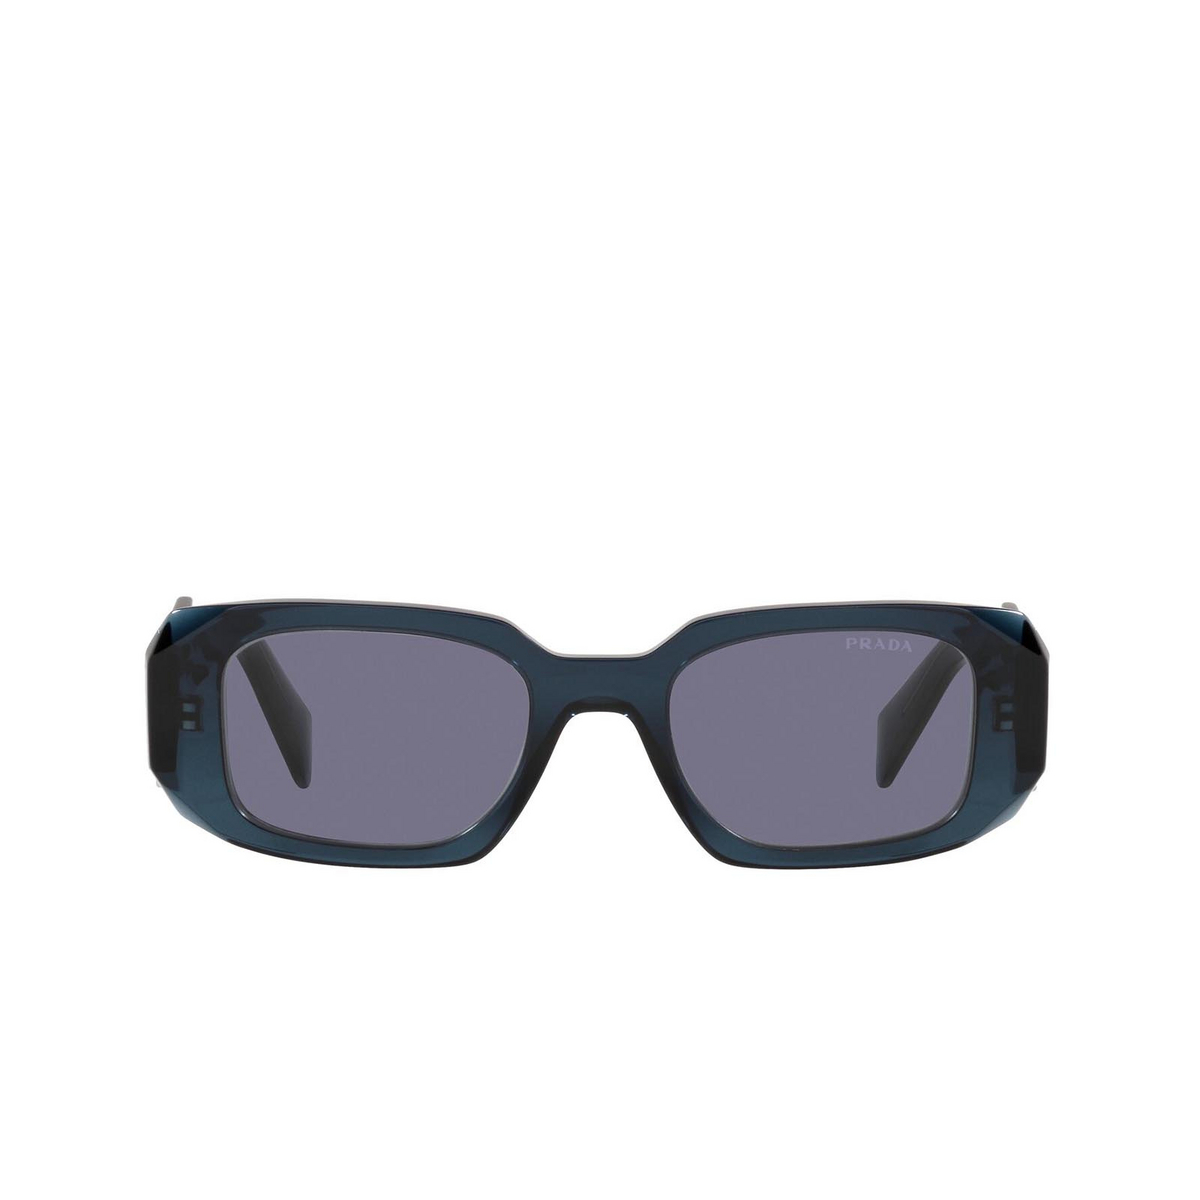 Prada® Rectangle Sunglasses: PR 17WS color Blue Crystal 08Q420 - front view.